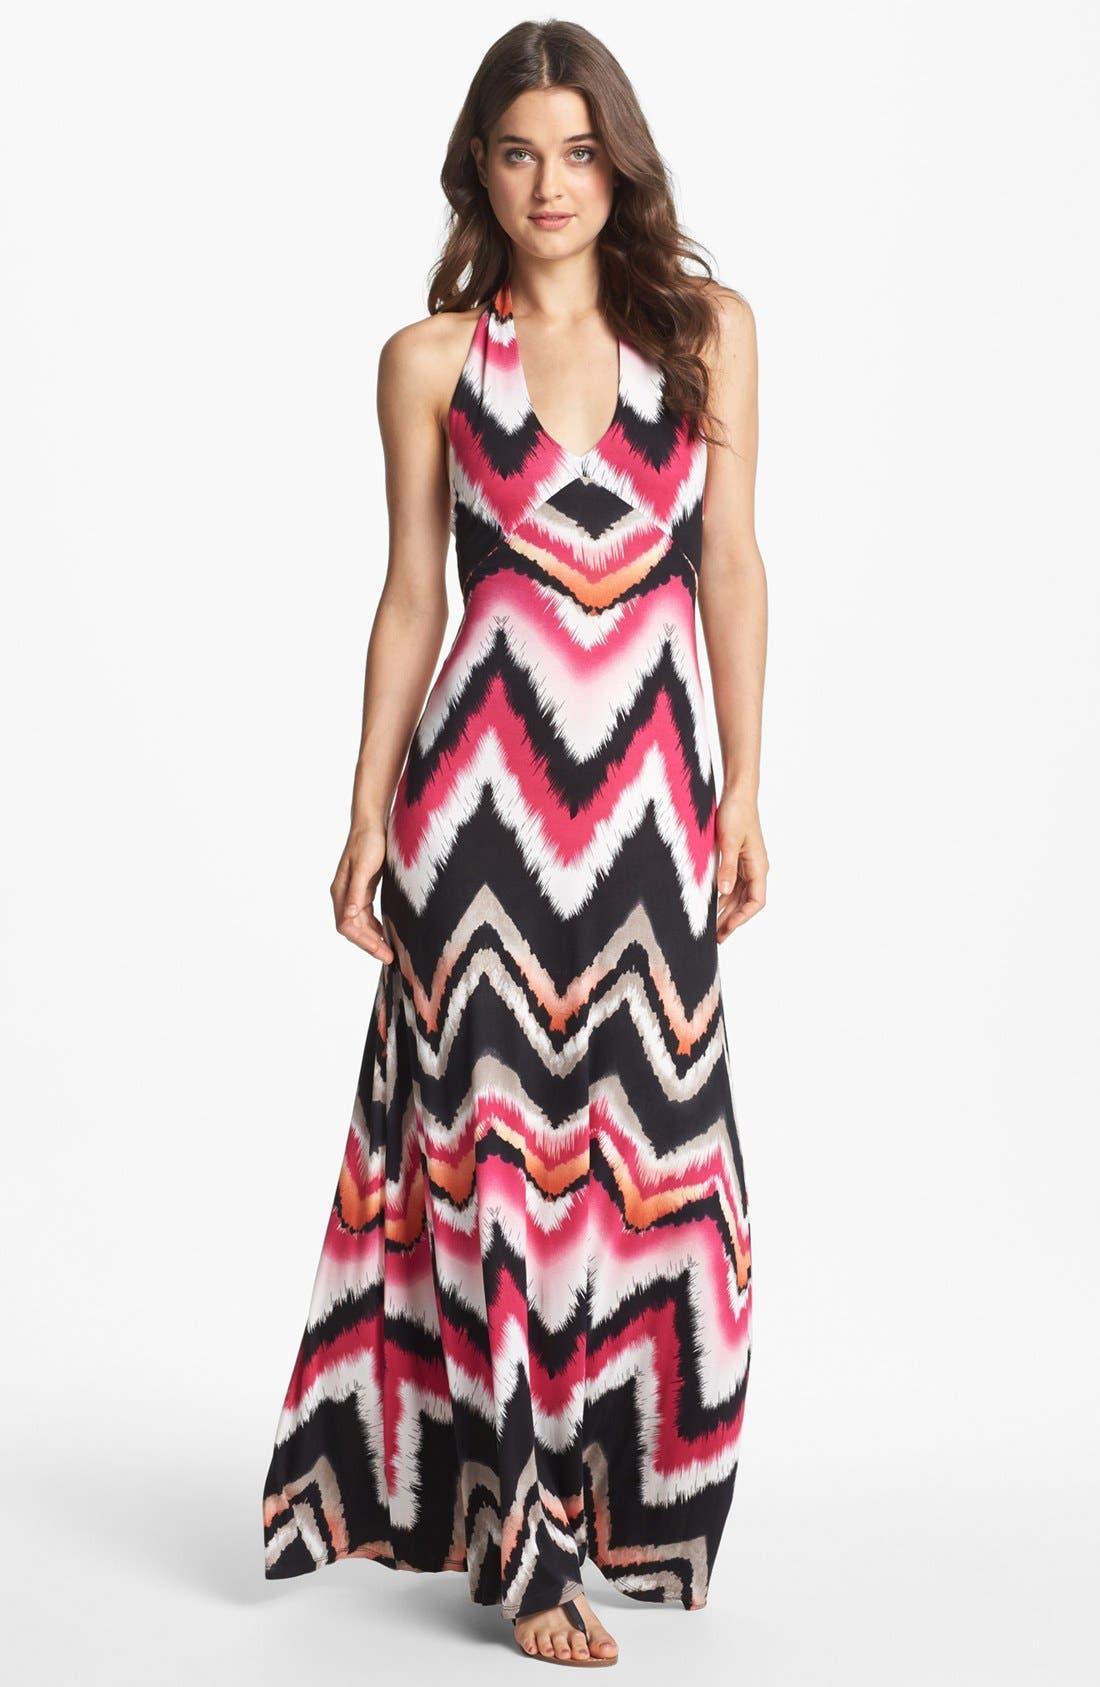 Alternate Image 1 Selected - Felicity & Coco 'Jesenia' Print Halter Maxi Dress (Nordstrom Exclusive)